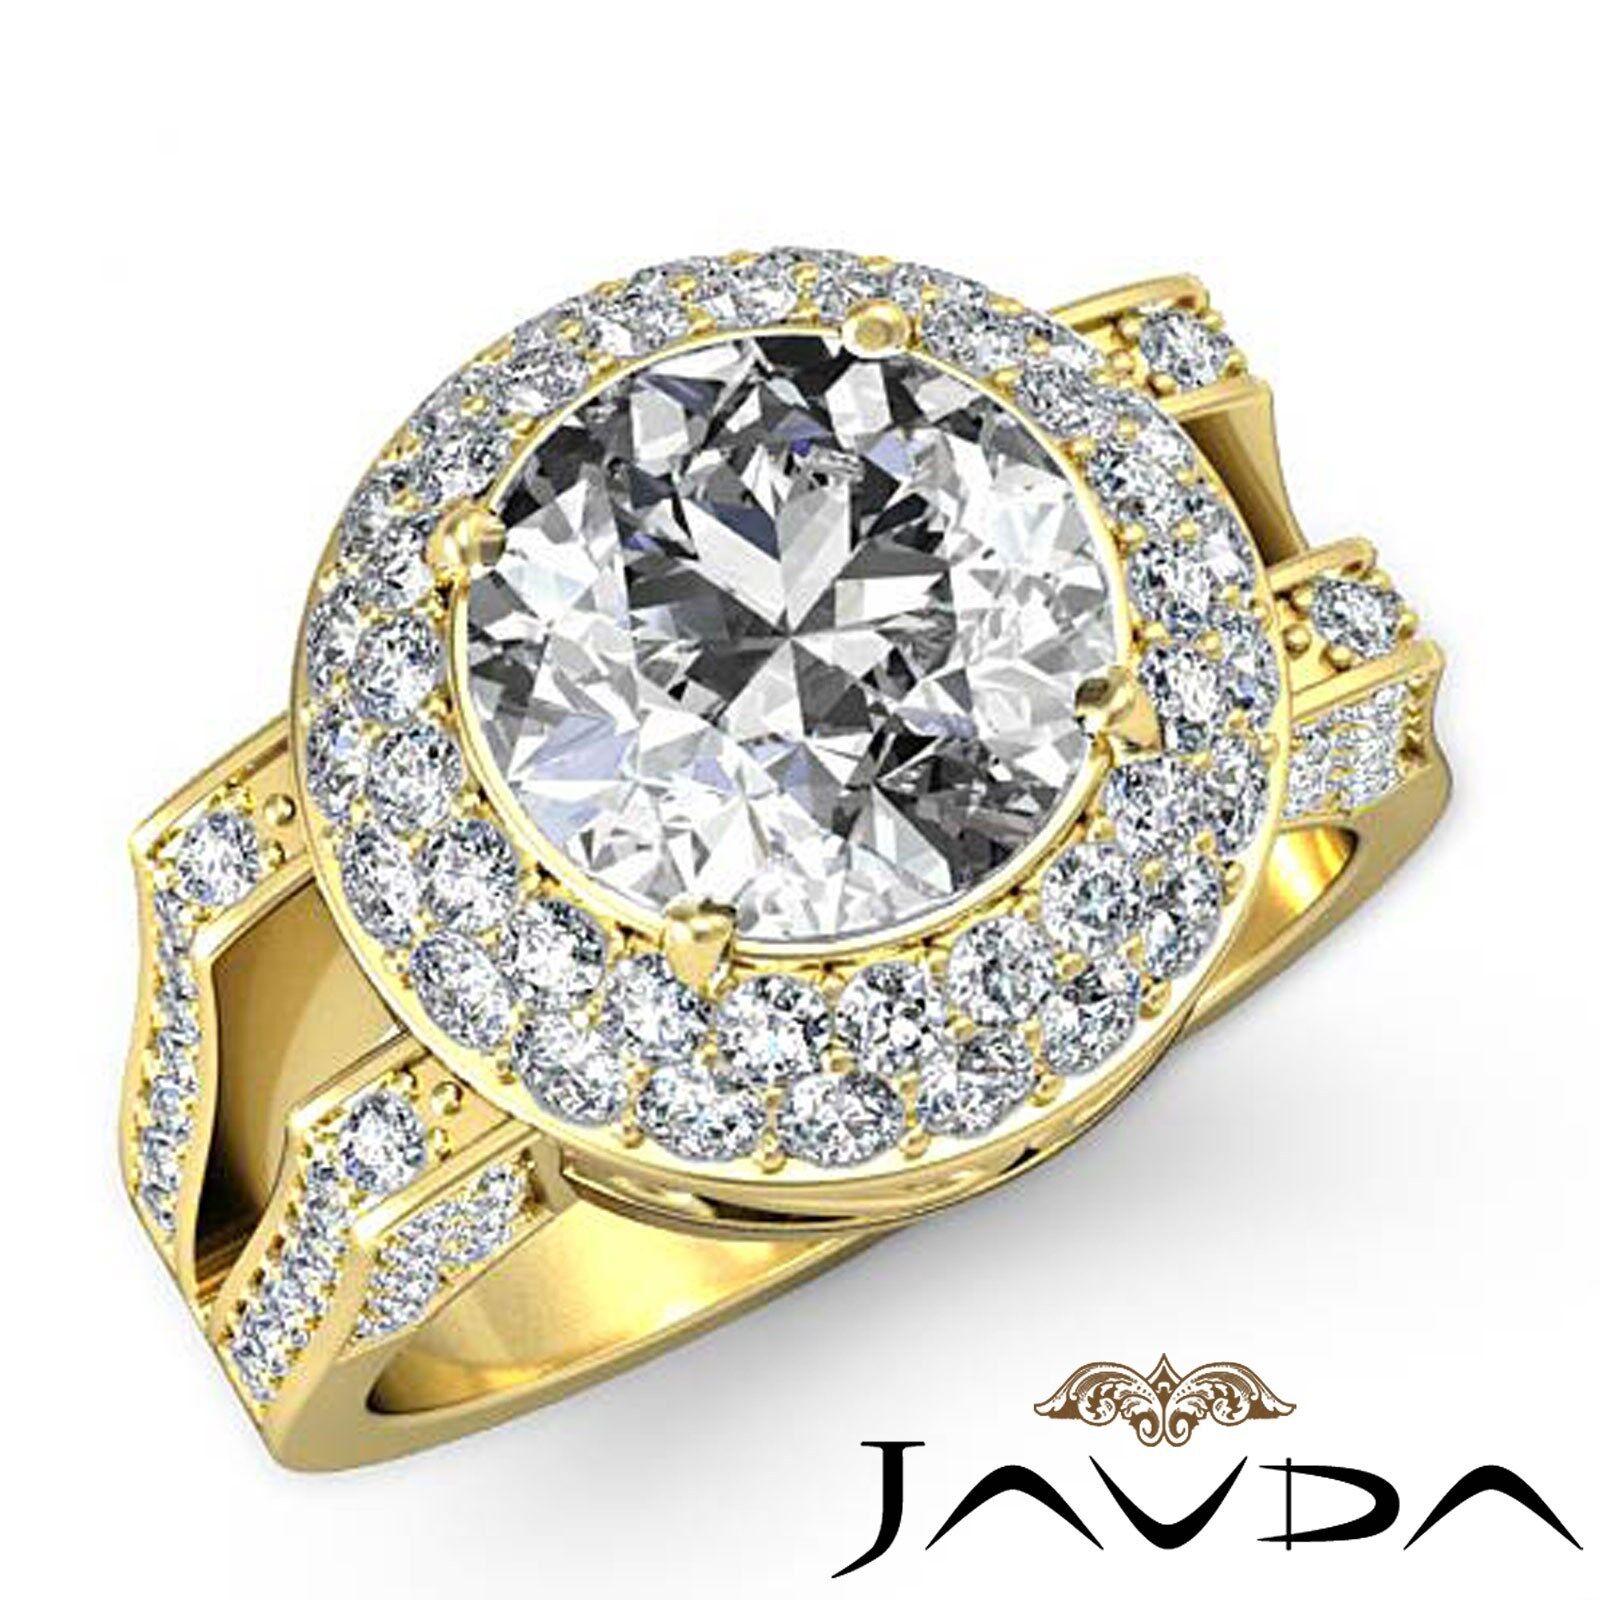 Double Halo Split Shank Round Diamond Engagement Pave Set Ring GIA F VS1 2.6 Ct